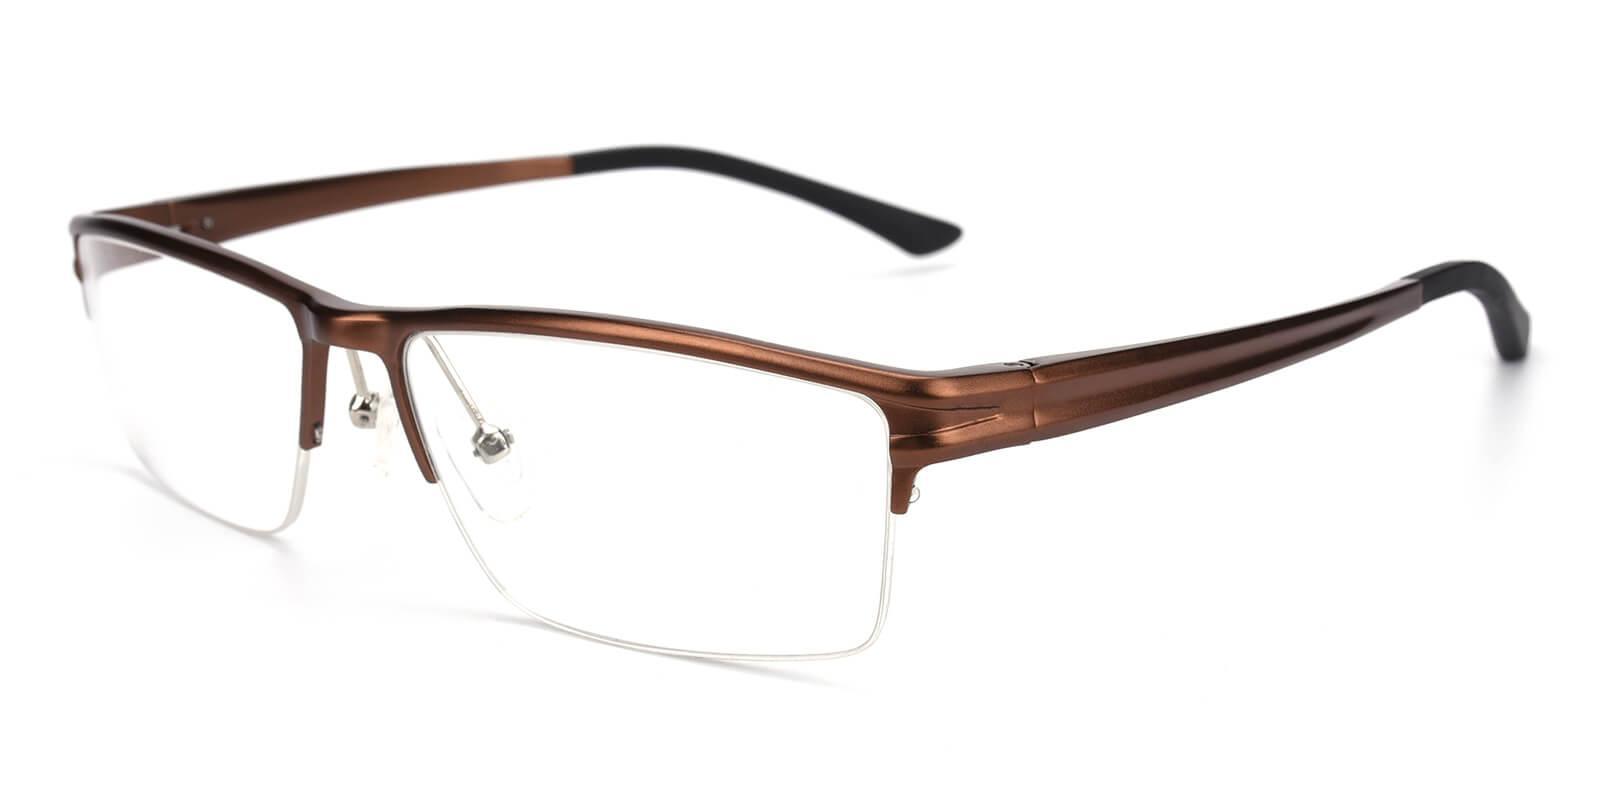 Leonado-Brown-Rectangle-Metal-Eyeglasses-additional1